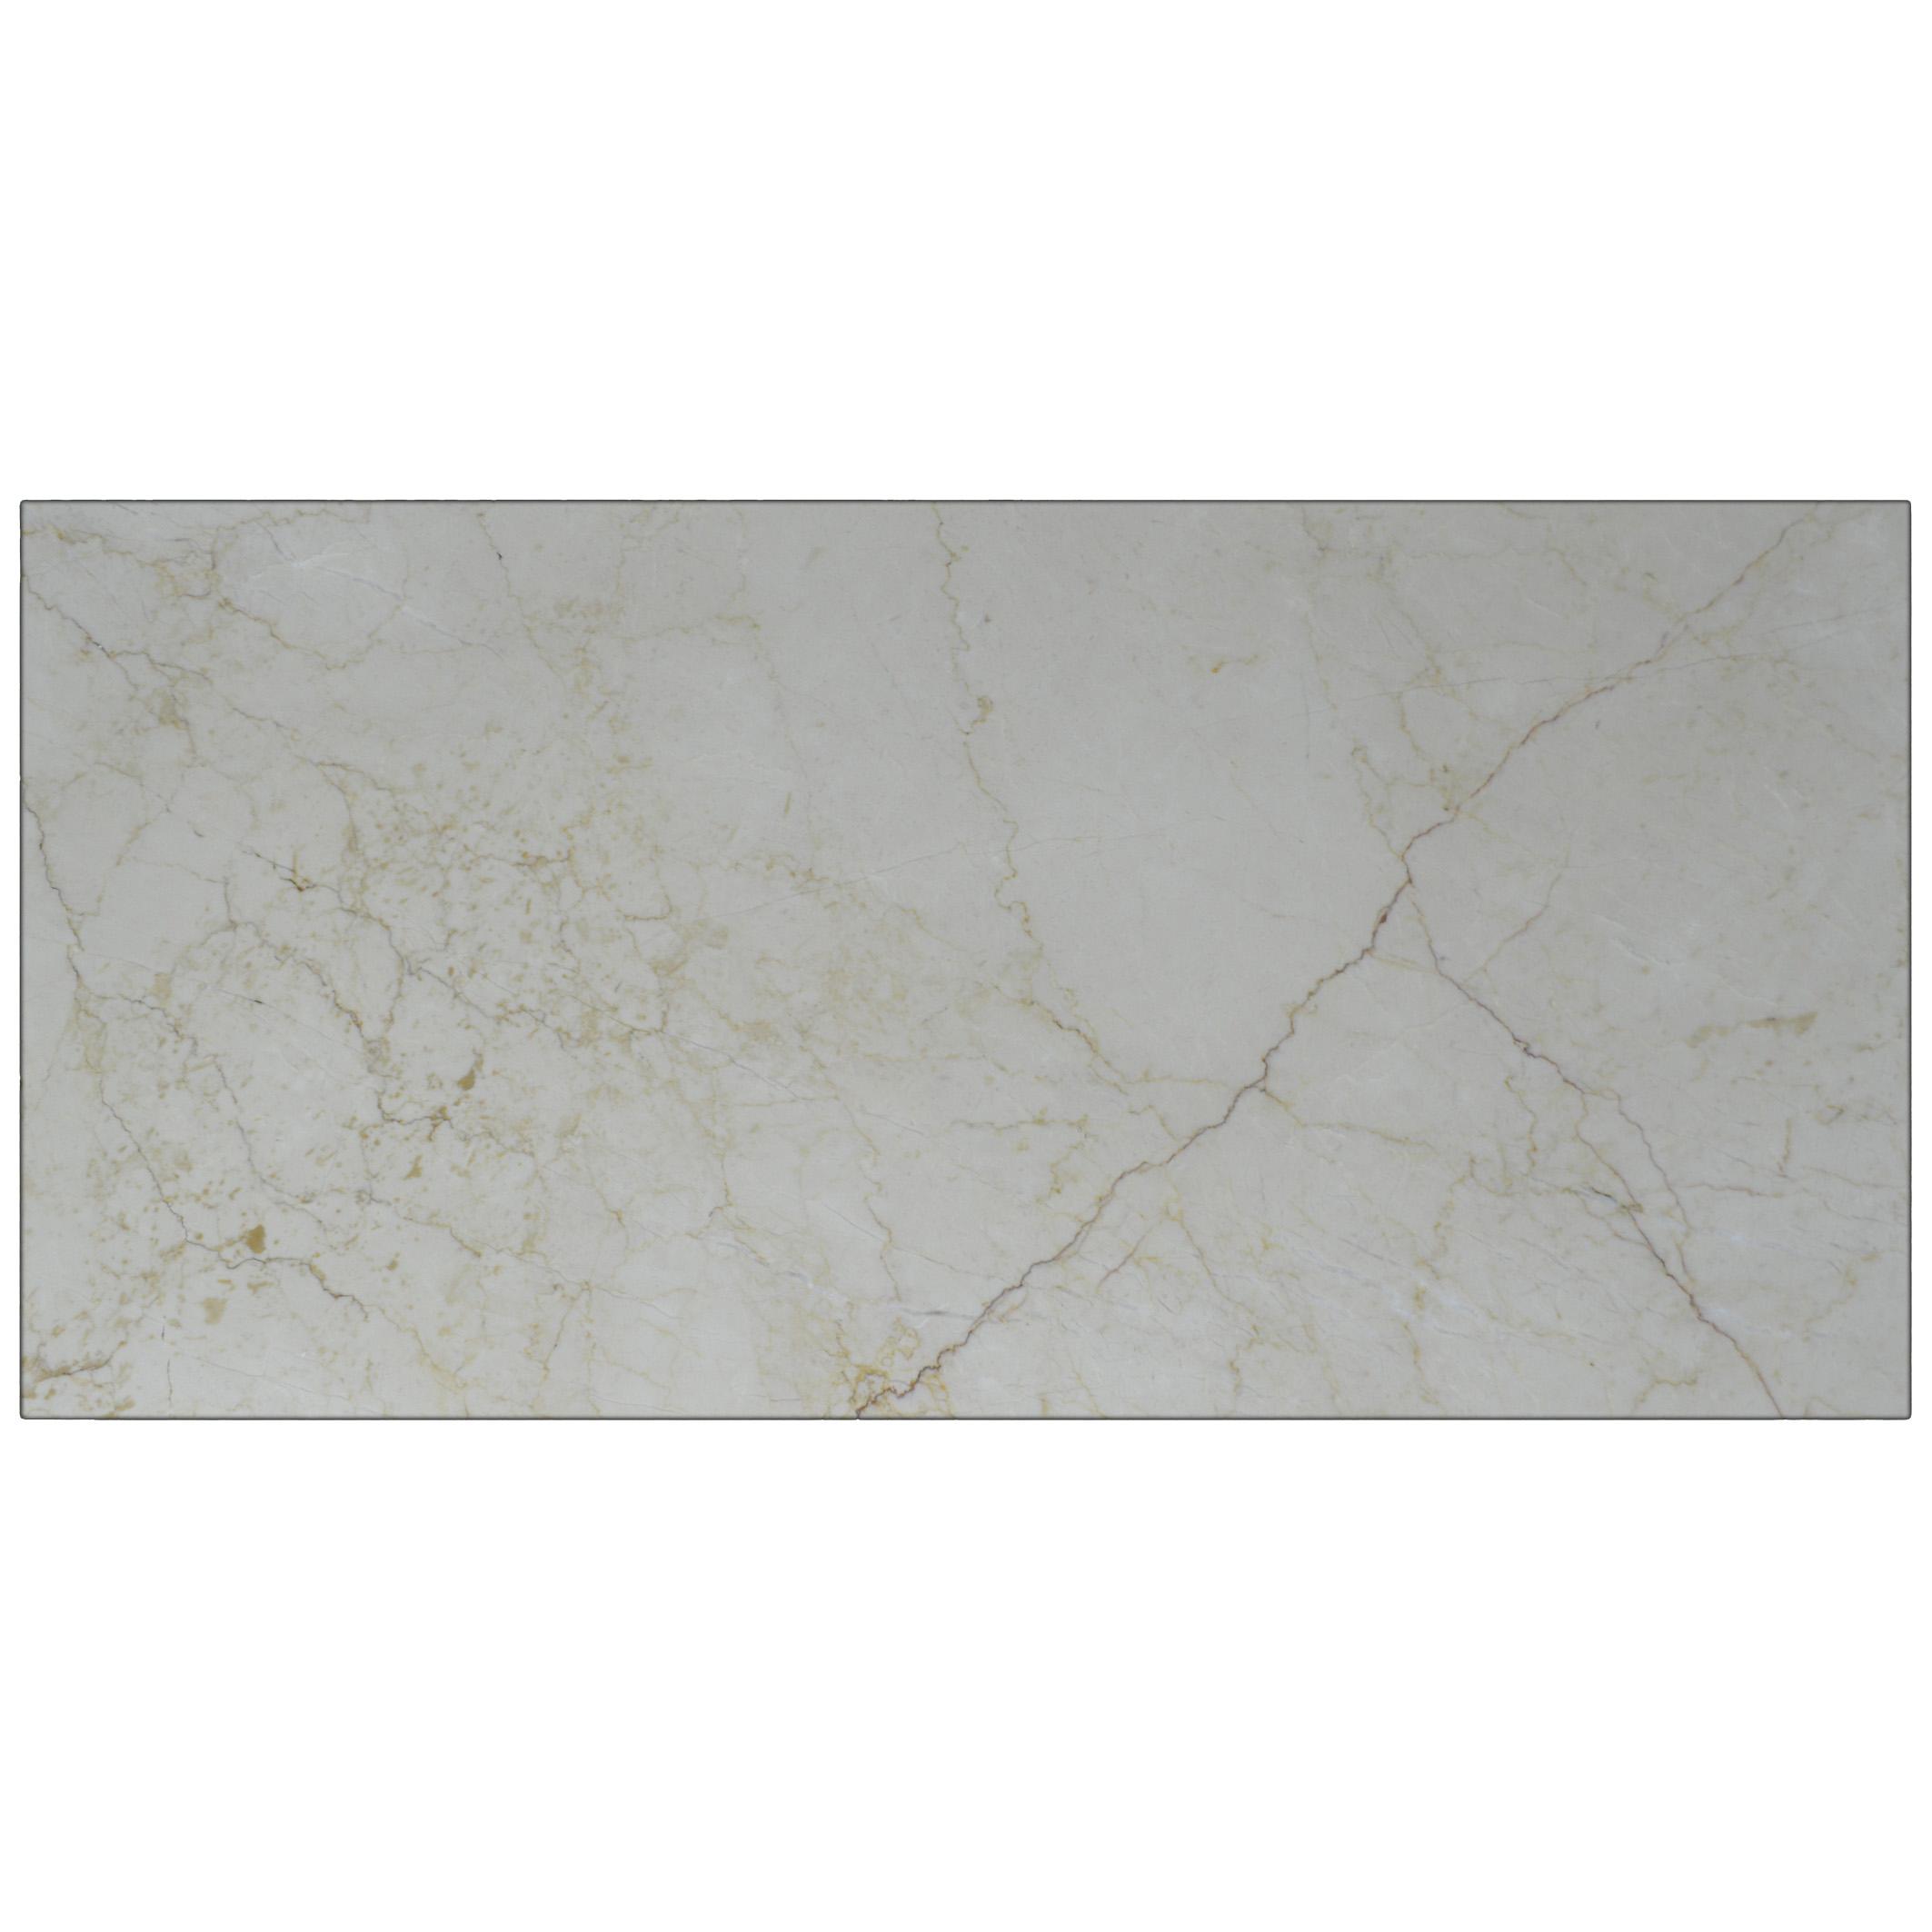 Cream Fantasy Polished Marble Tiles 18x36-marble sale-Atlantic Stone Source